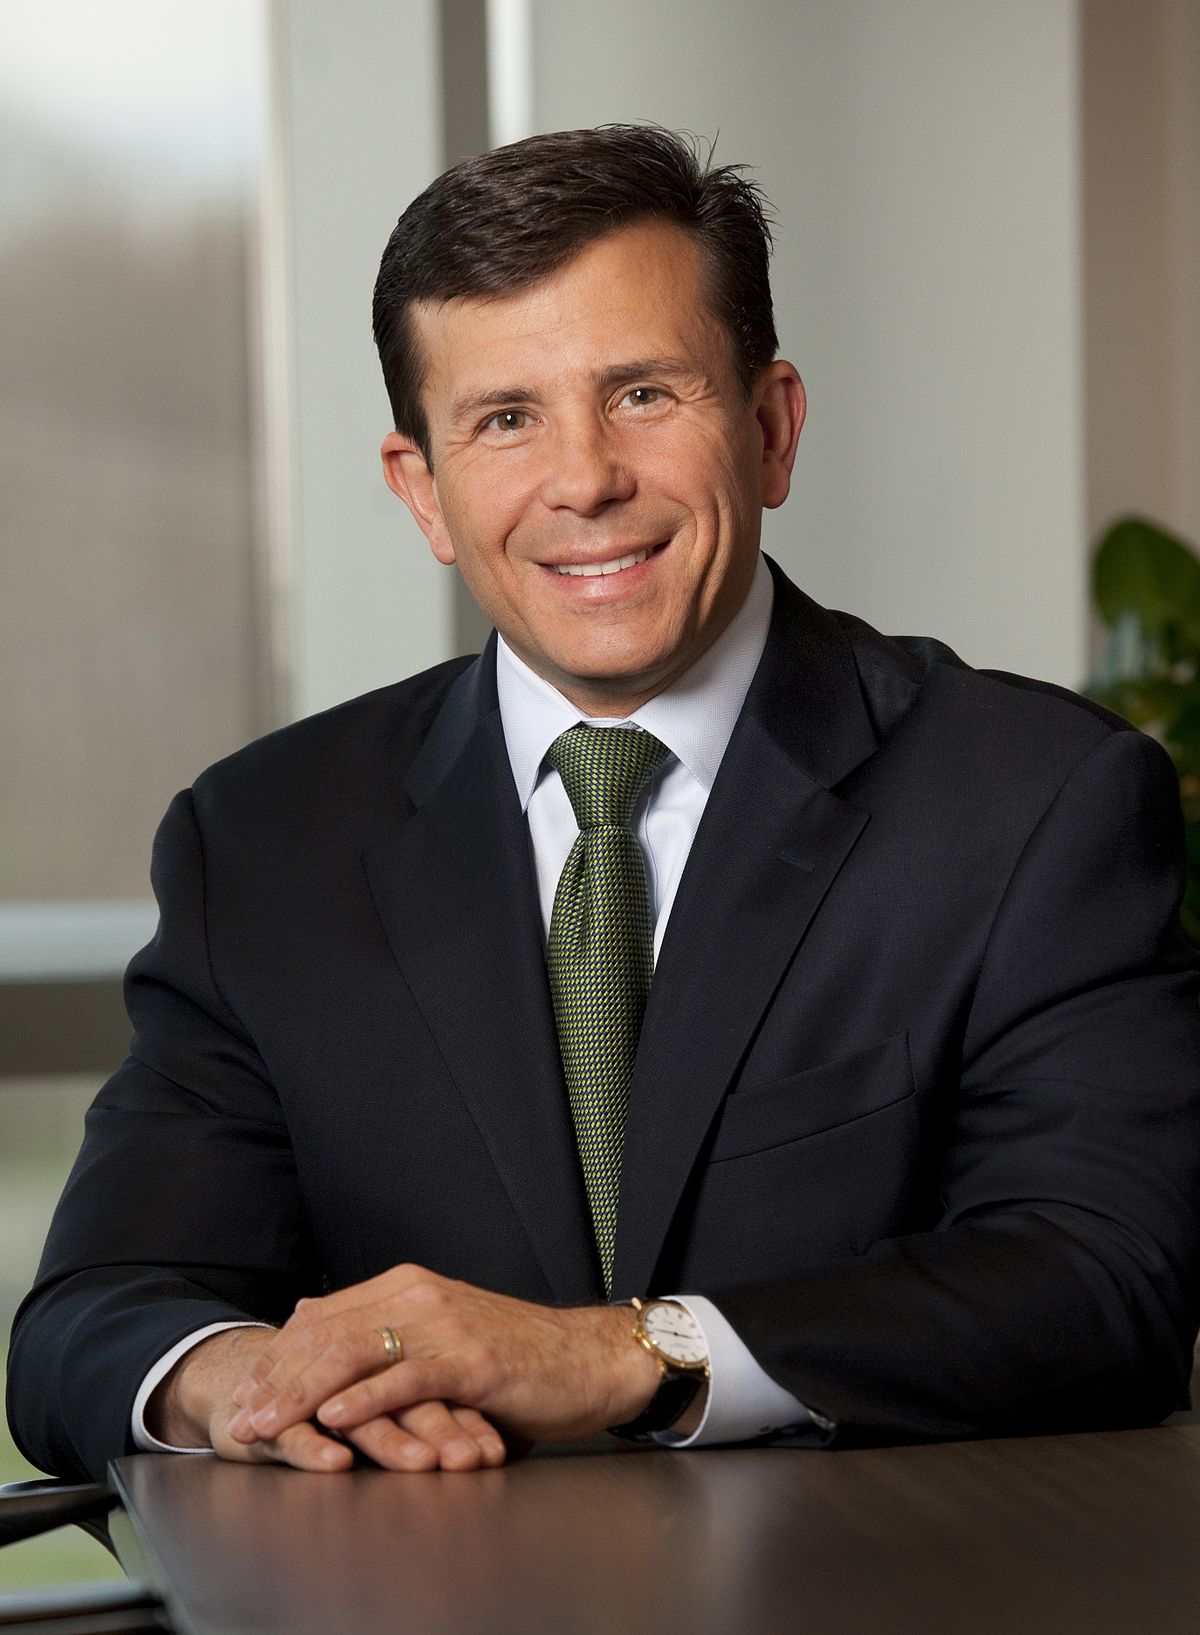 John Crowley Biotech Executive Wikipedia